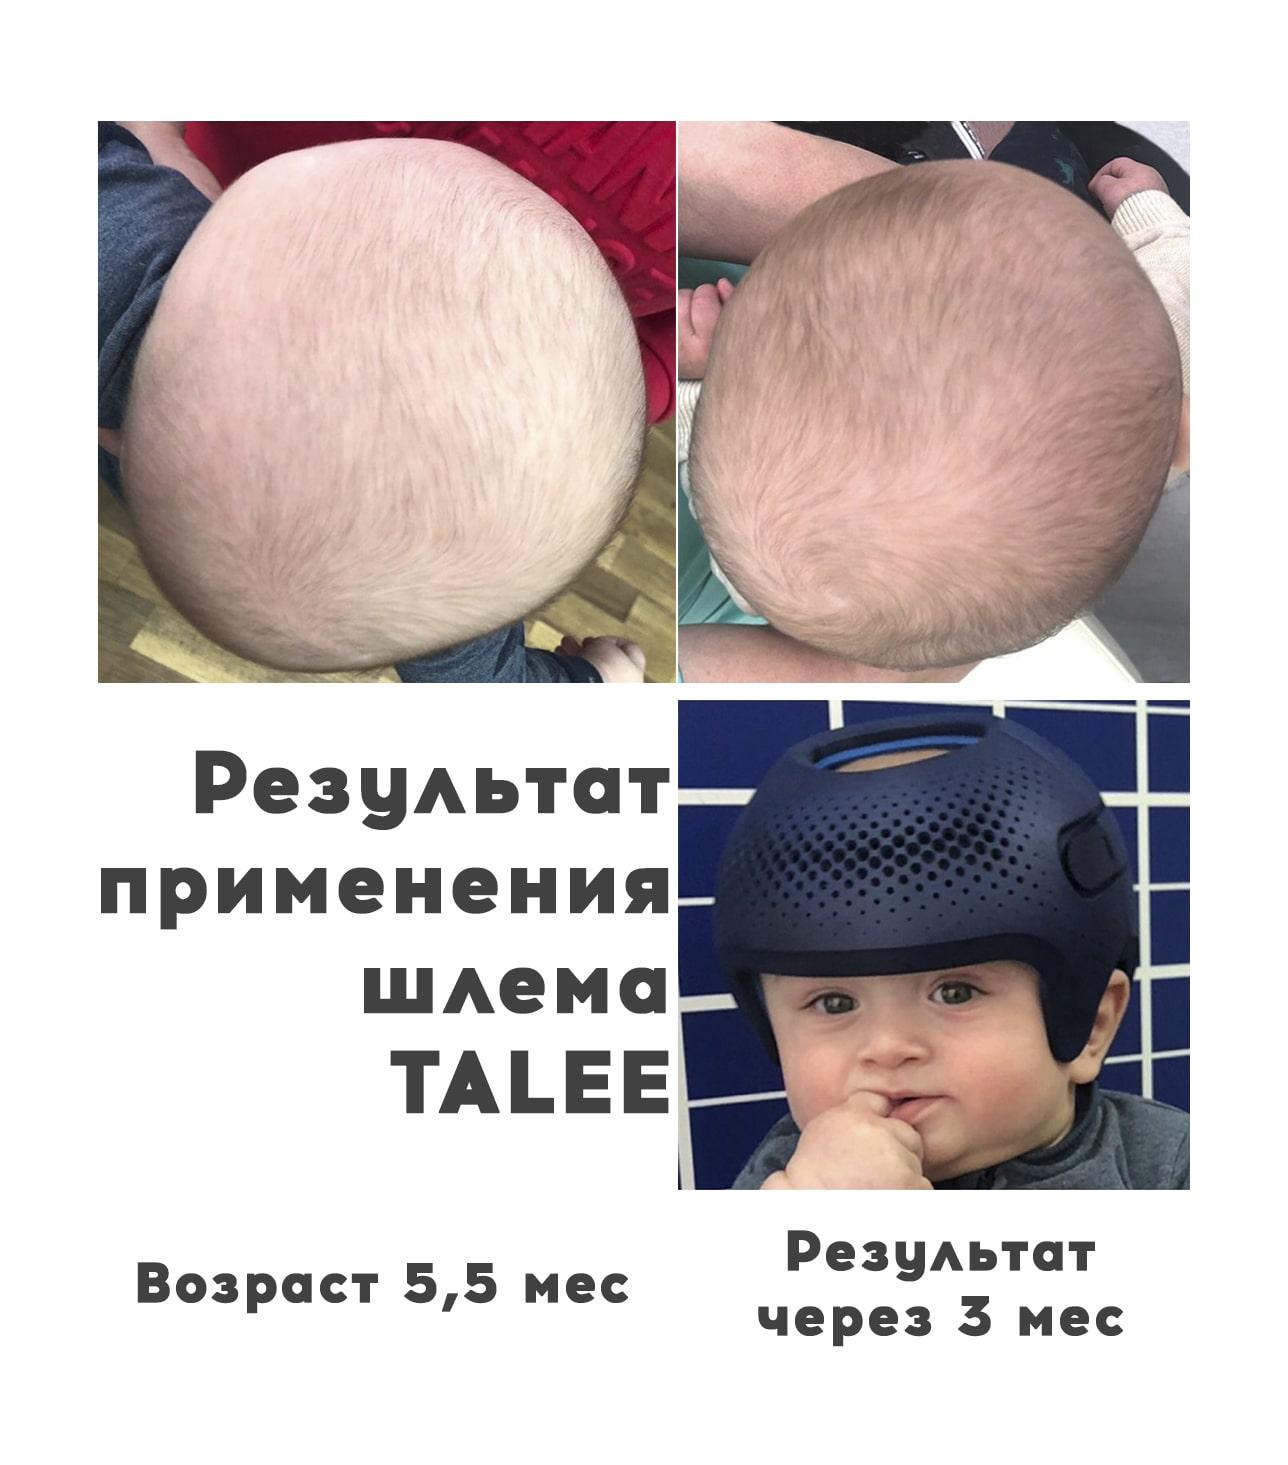 Асимметричная брахицефалия, 4 месяцев - Ортотис Премиум